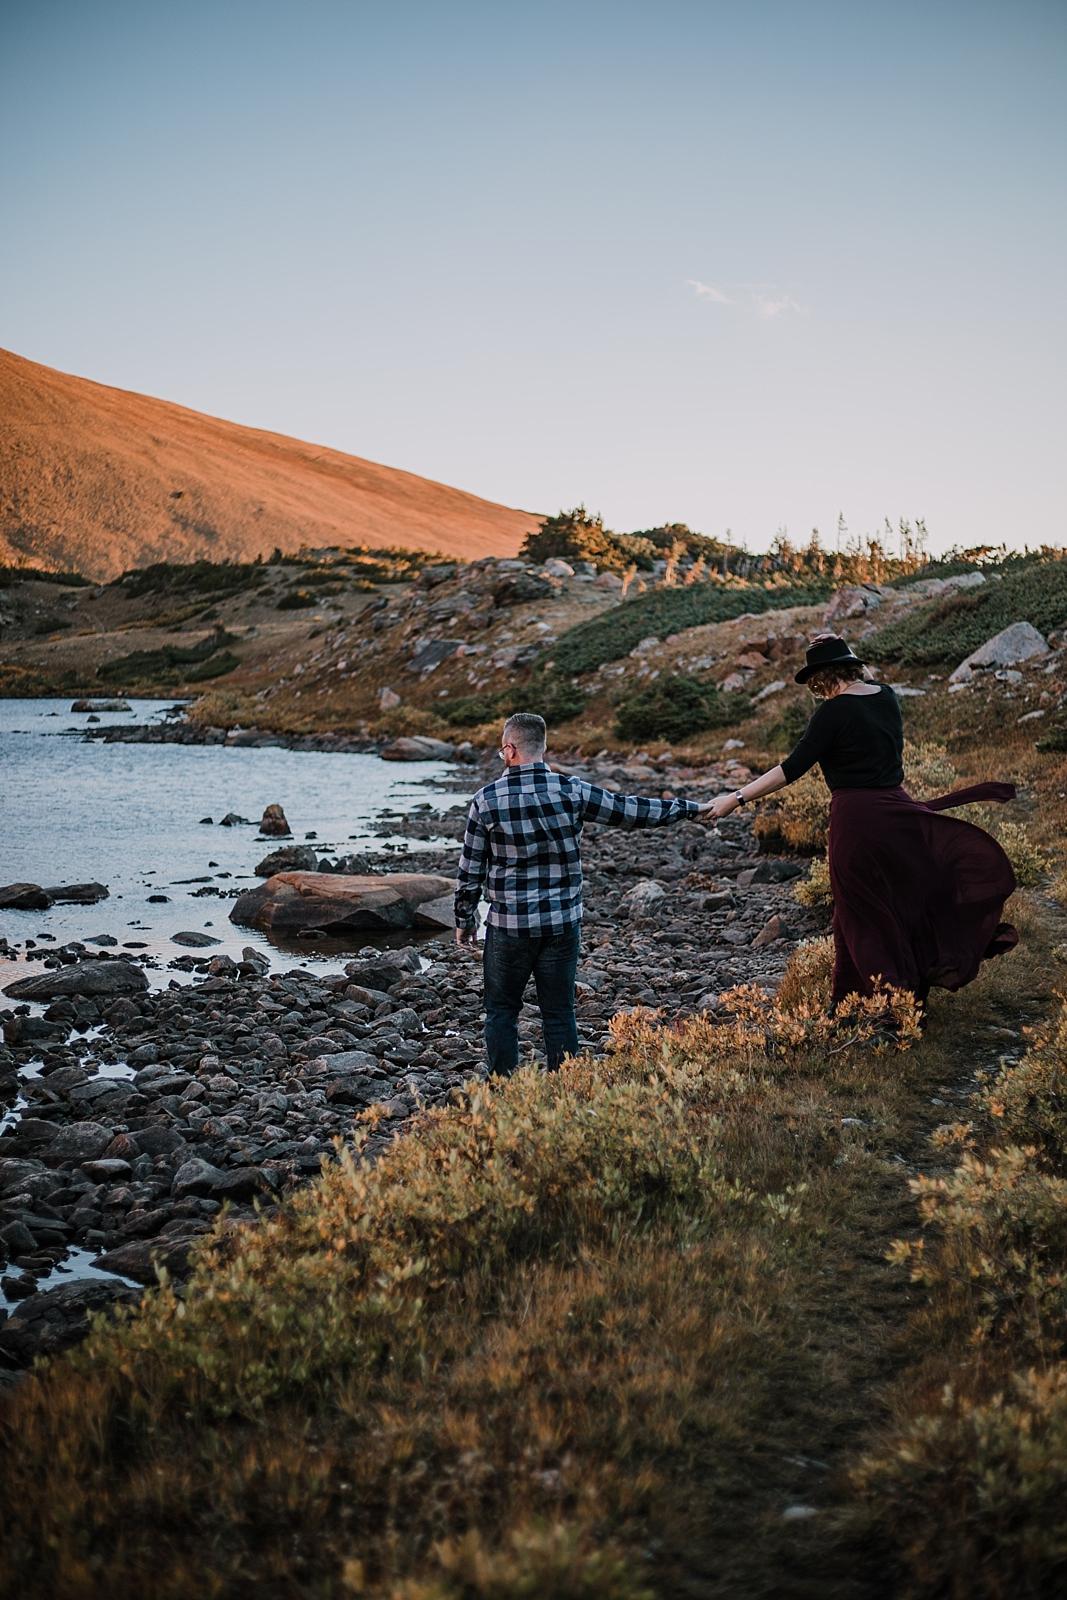 sunrise at james peak, colorado 13er, little echo lake, backpacking james peak wilderness, hike james peak lake, hike little echo lake, james peak elopement, winter park sunrise elopement